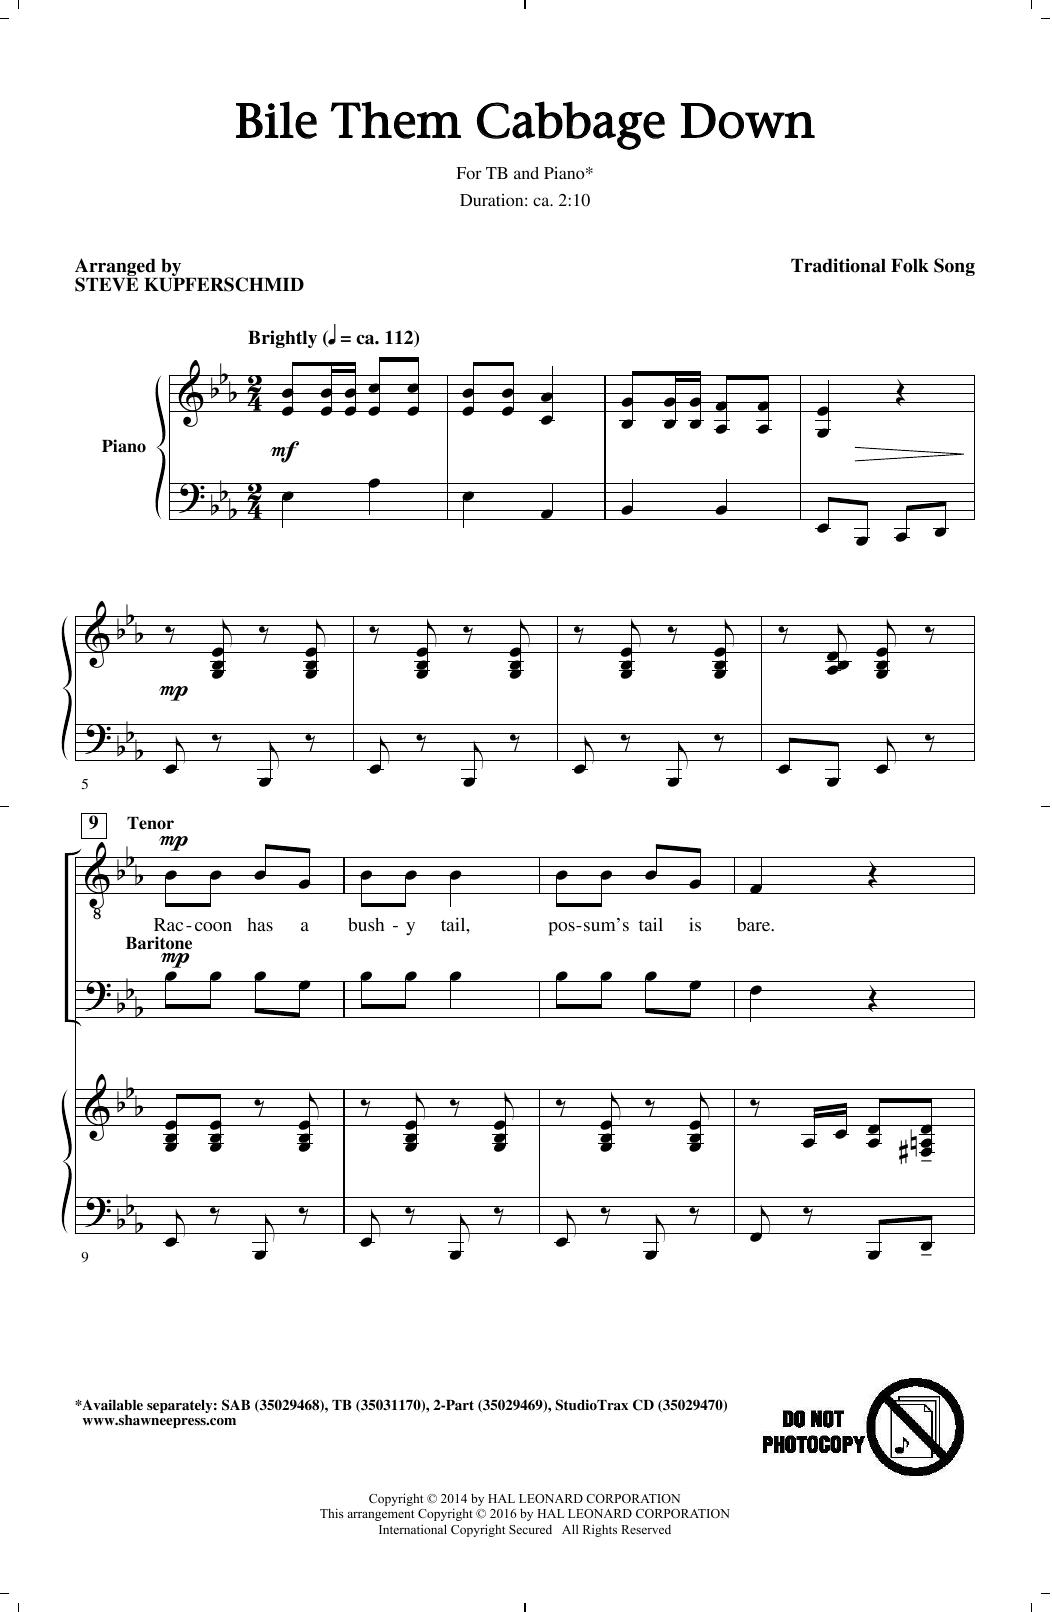 Bile Them Cabbage Down (arr. Steve Kupferschmid) Sheet Music